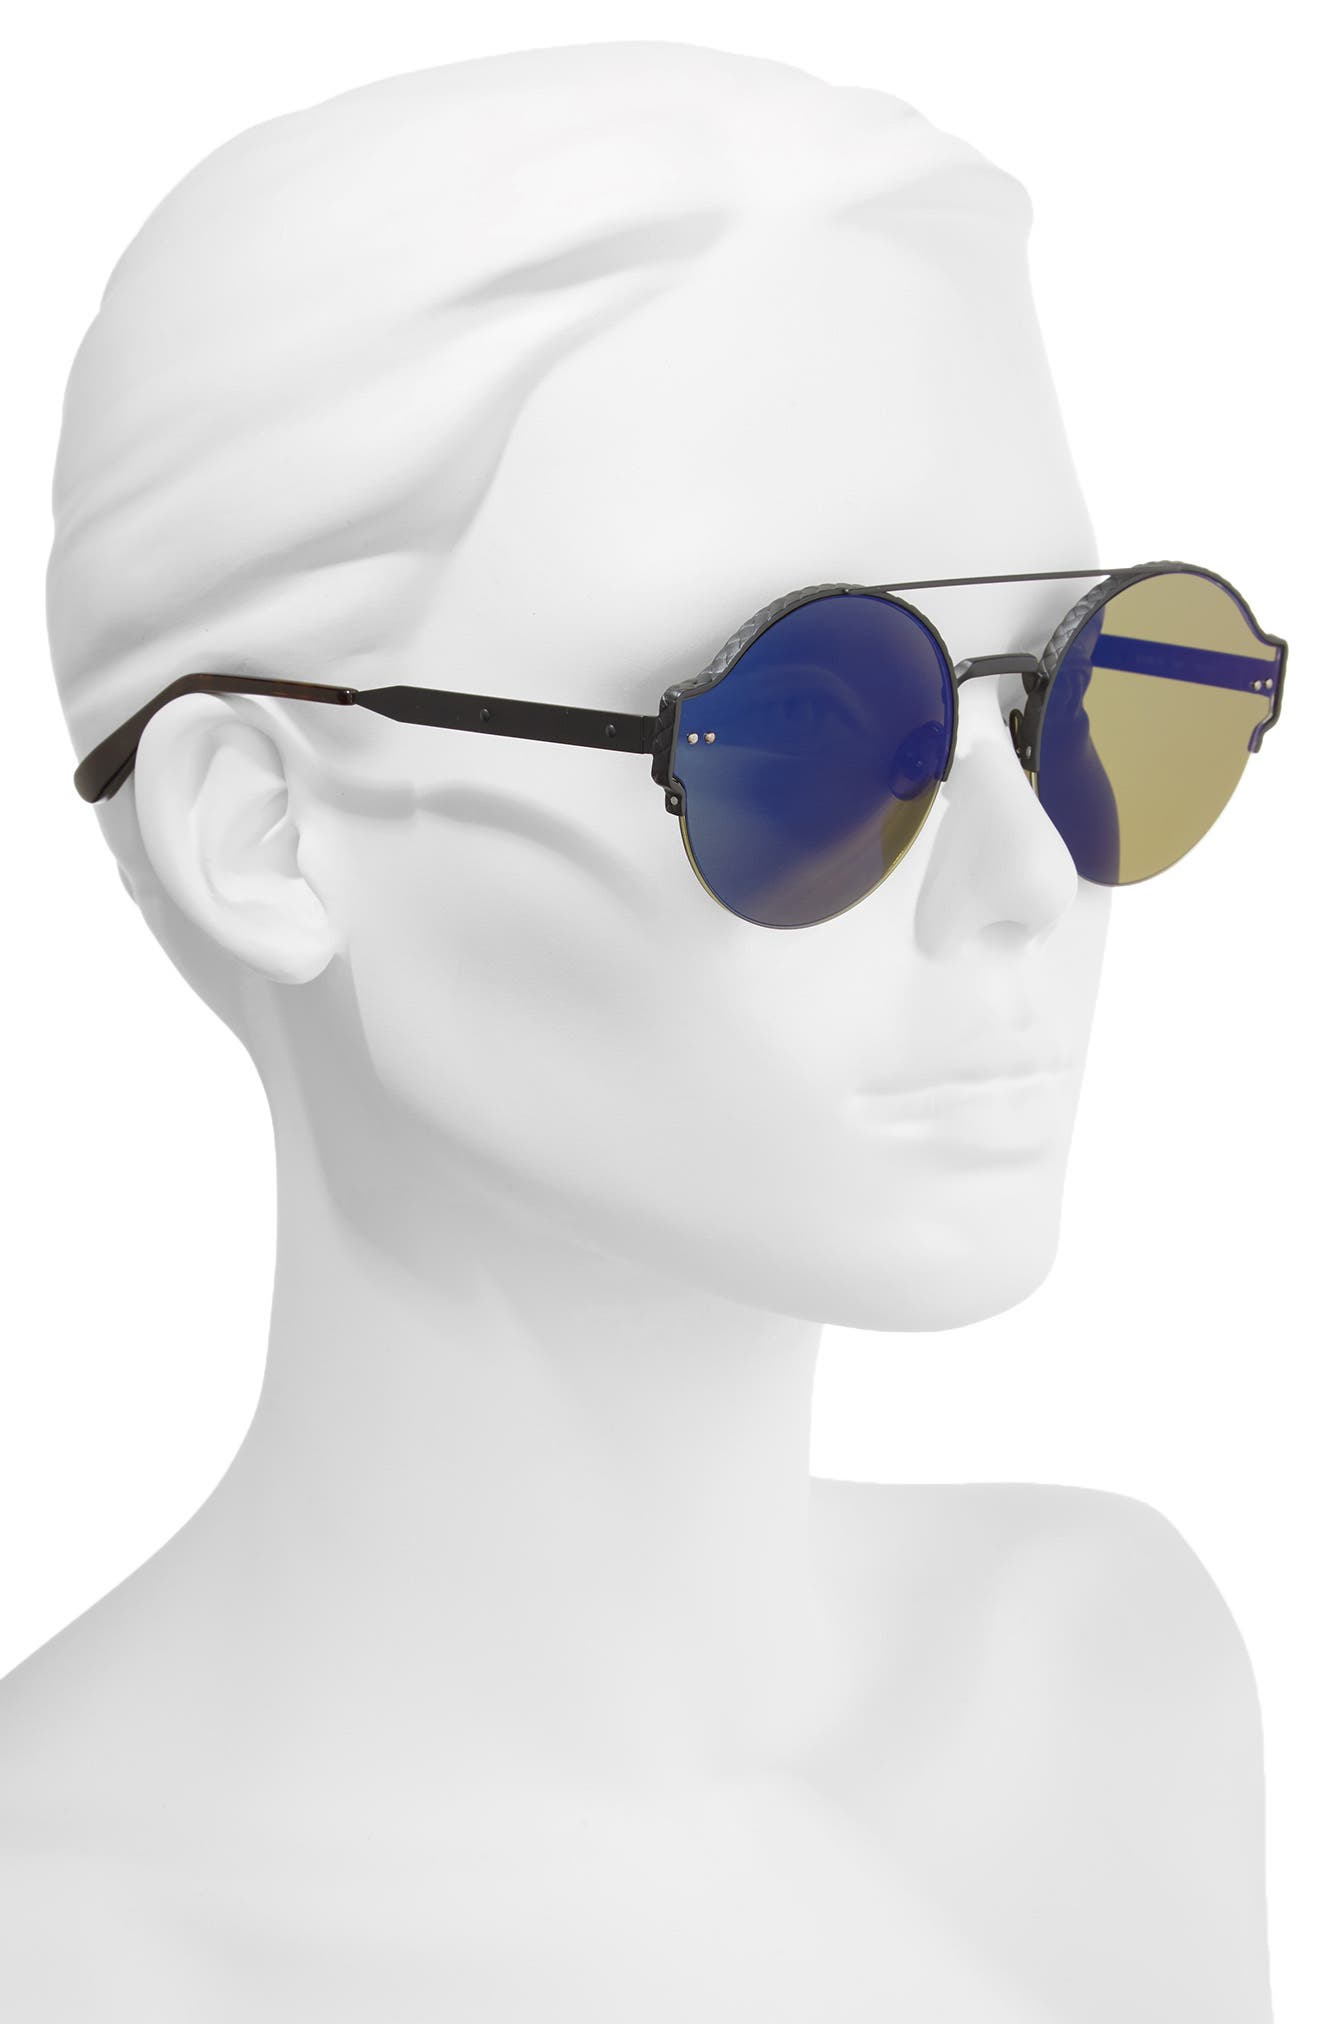 54mm Round Semi-Rimless Sunglasses,                             Alternate thumbnail 4, color,